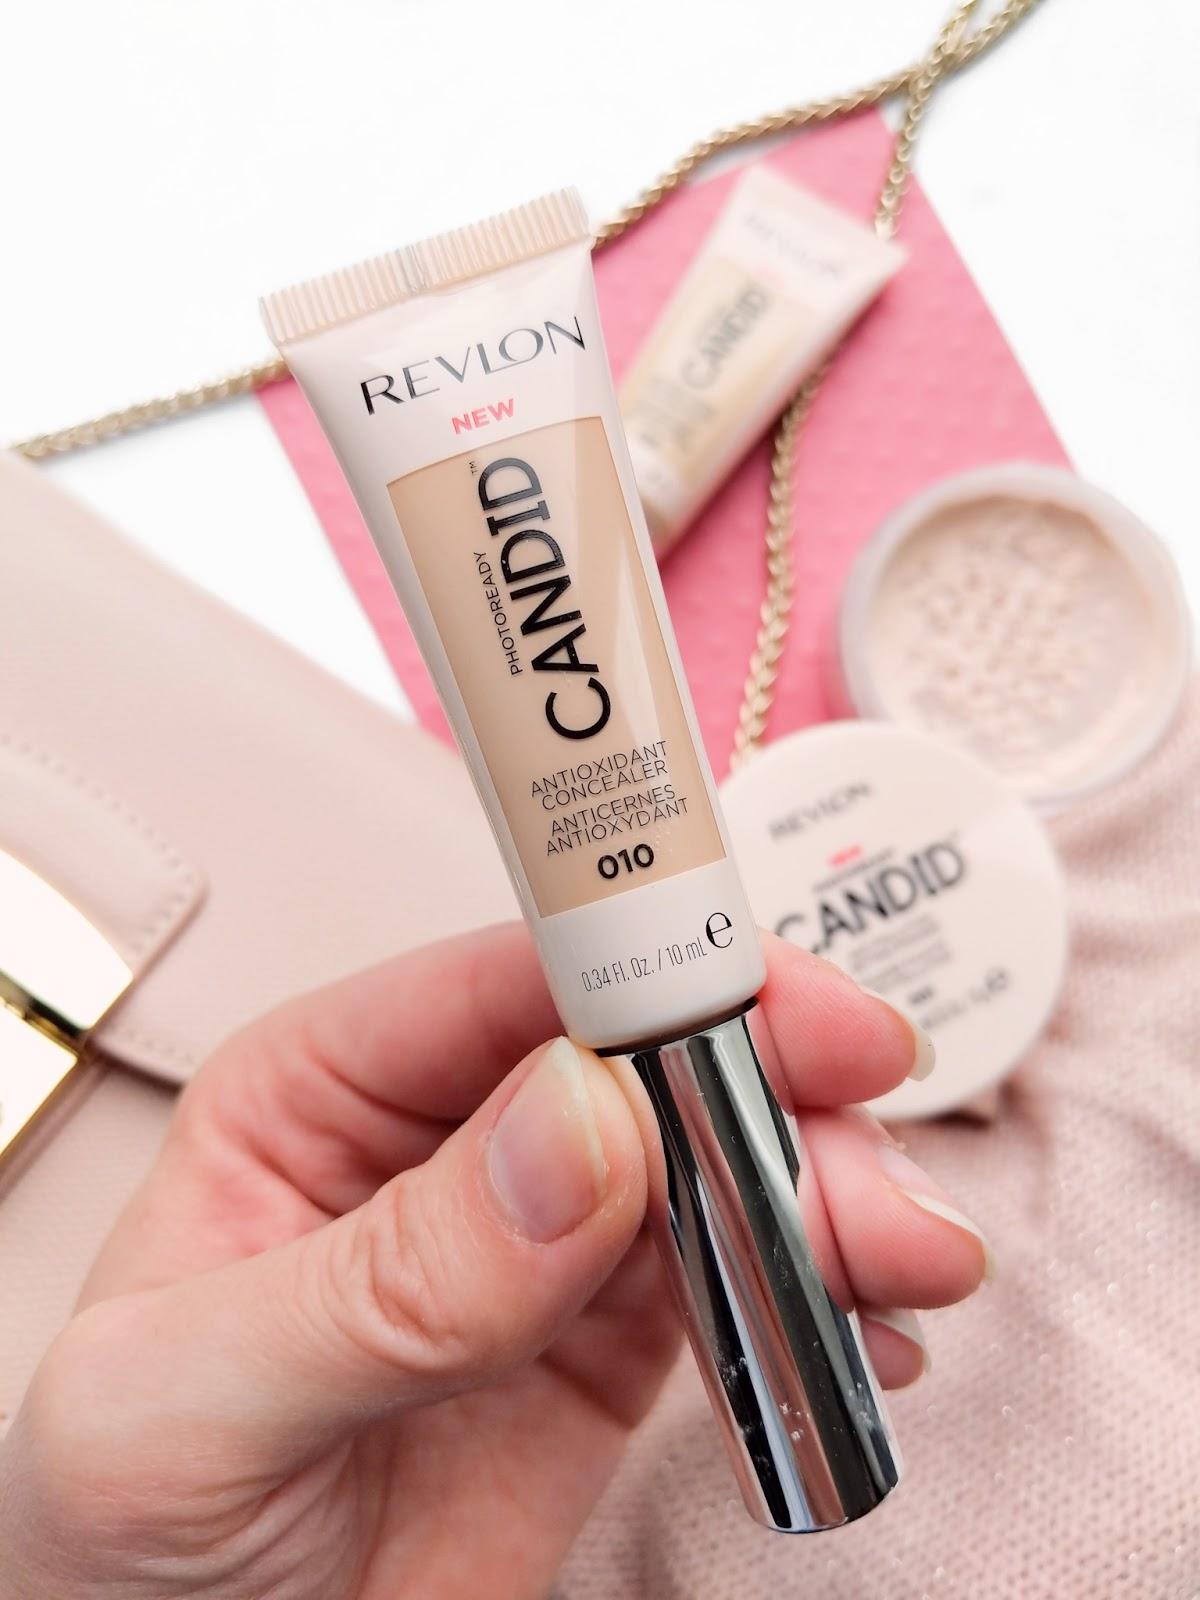 Revlon-Candid-Photoready-Antioxidant-Concealer-Shade-010-Vanilla